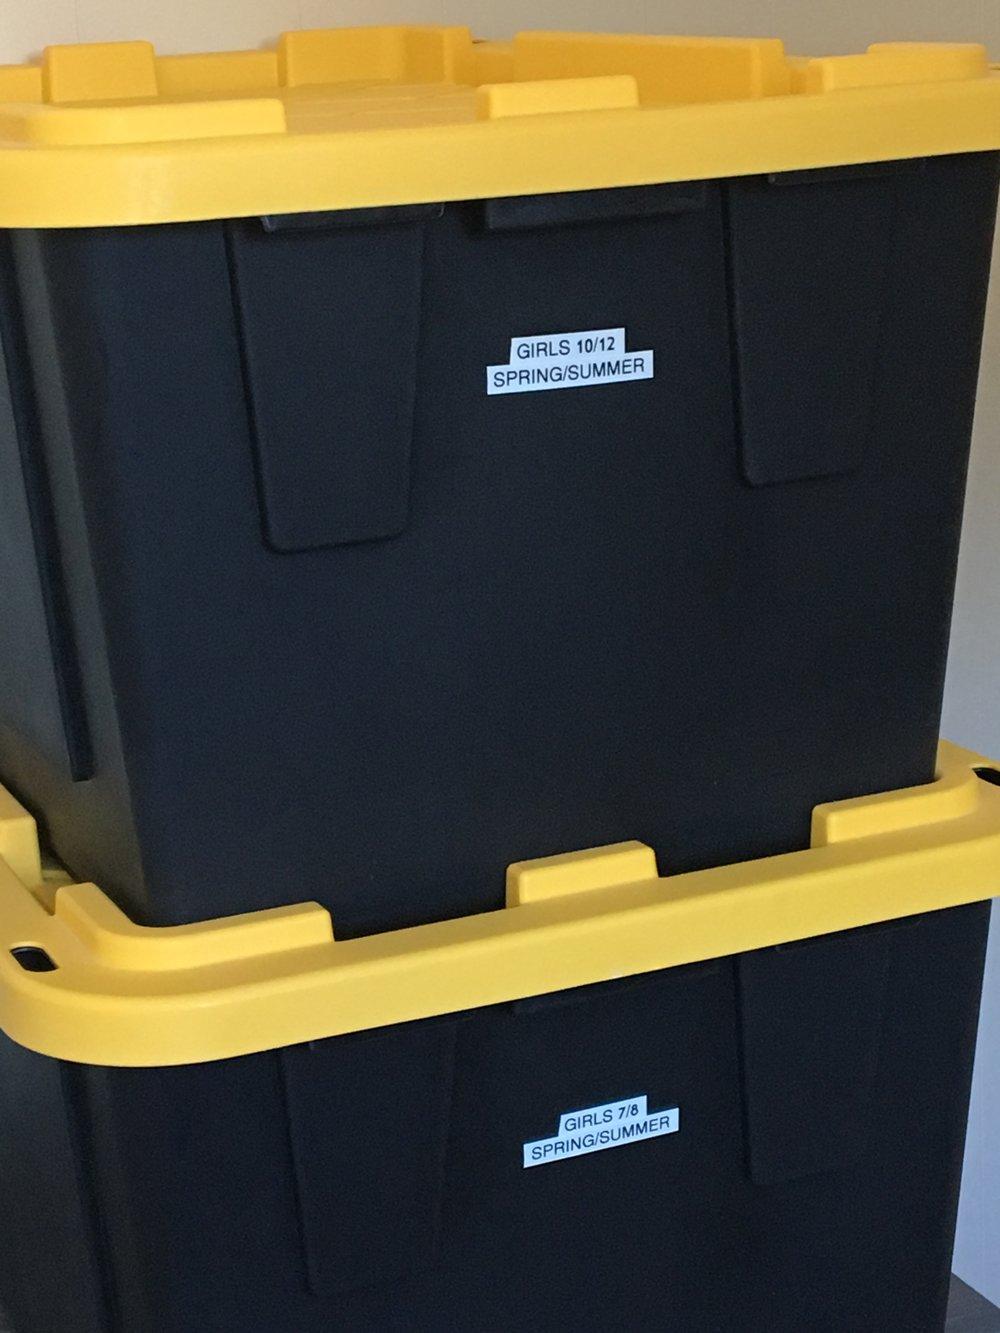 Off season storage bins & Organizing and Storing Kids Clothing u2014 Plum Cheeky Solutions-Lovin ...